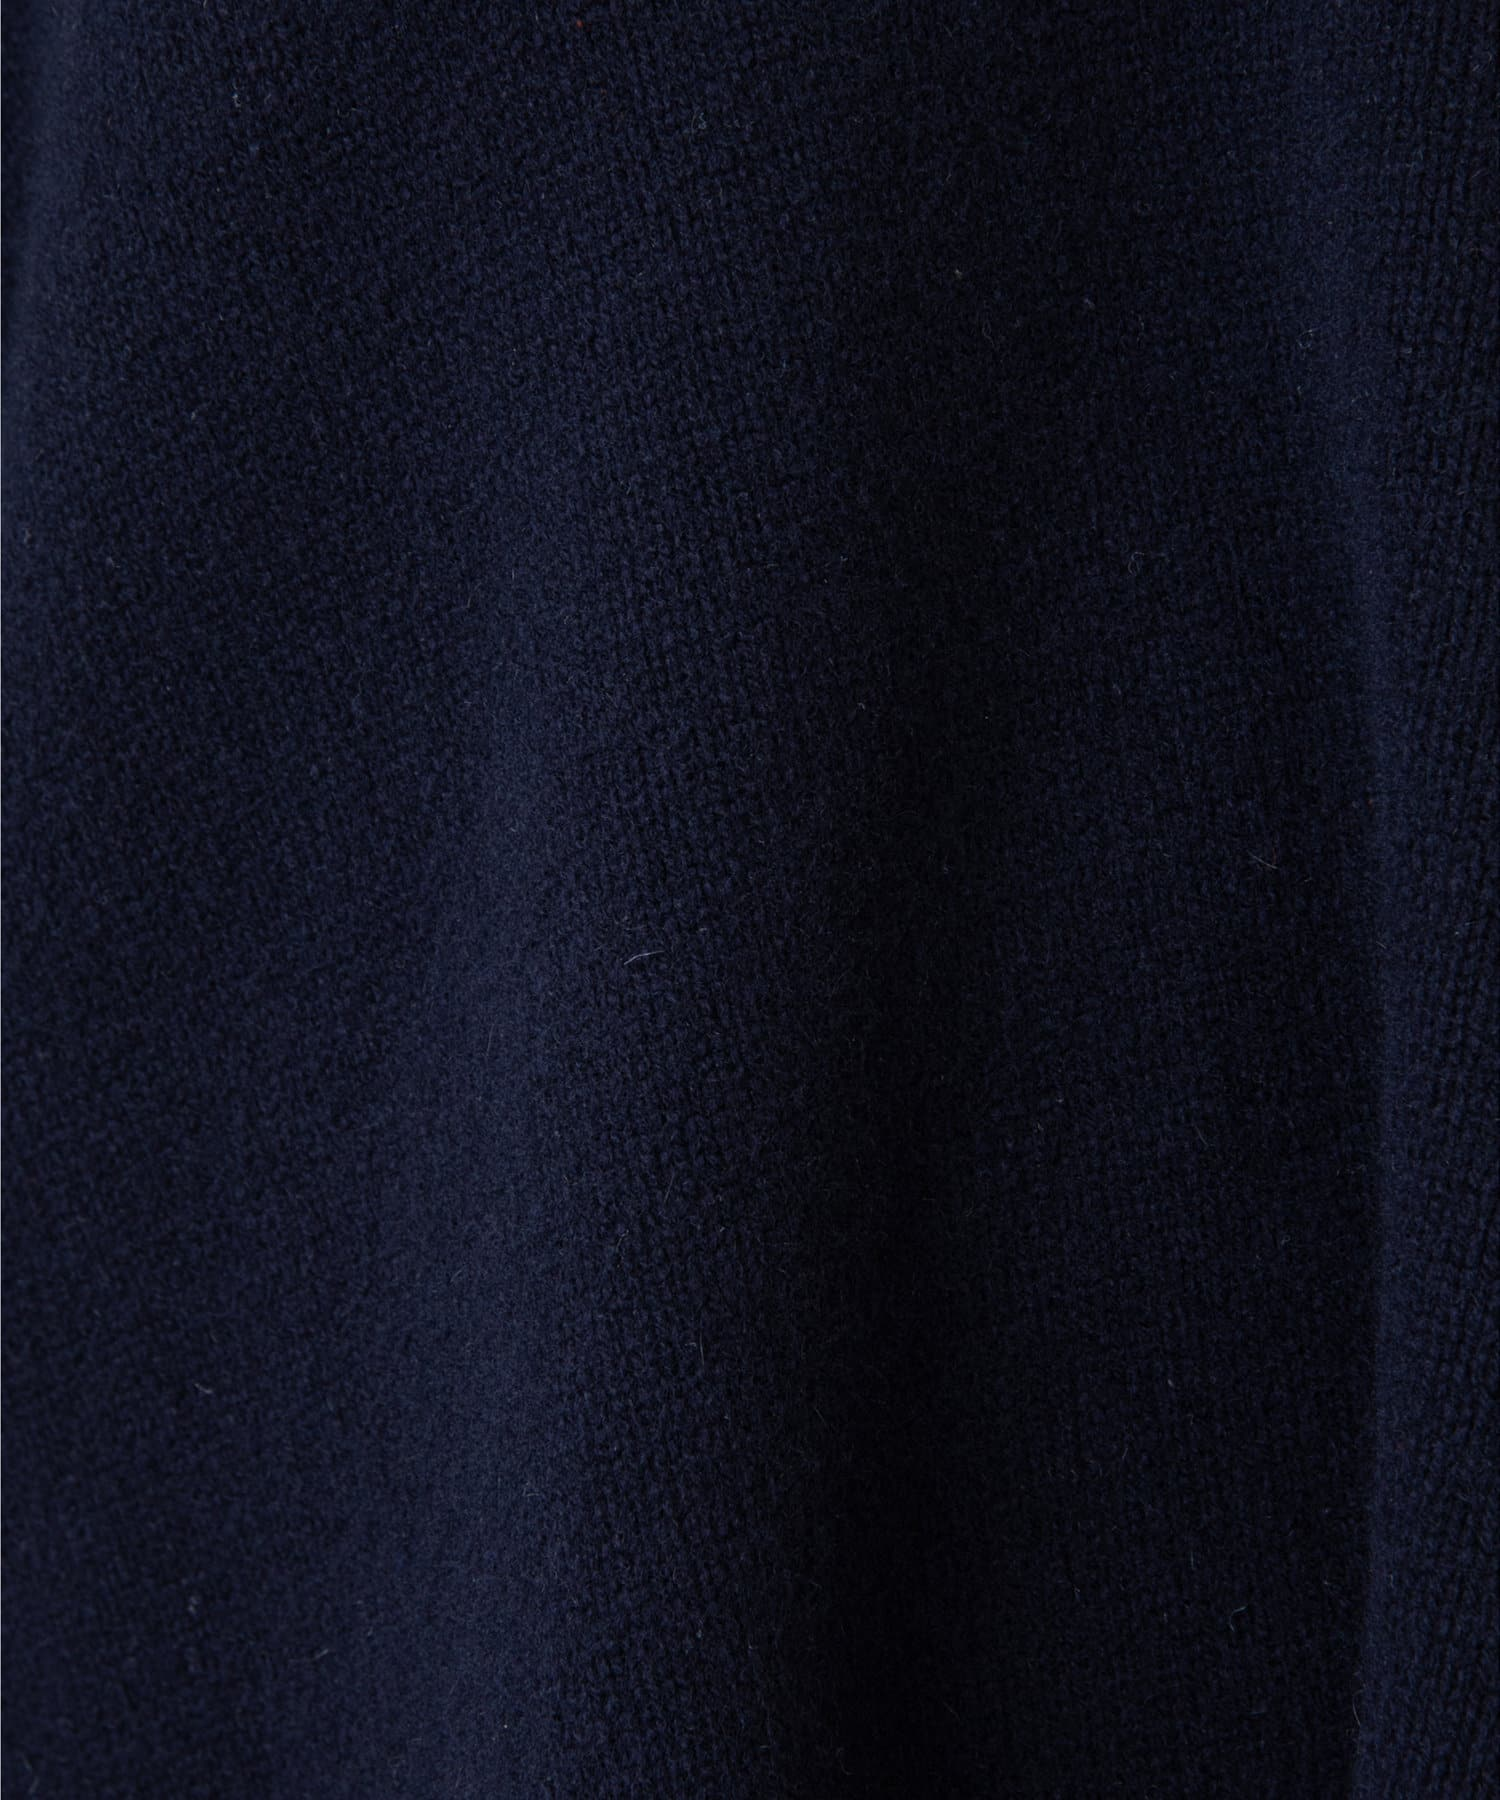 GALLARDAGALANTE(ガリャルダガランテ) 【CEPIE.】DeepVニット